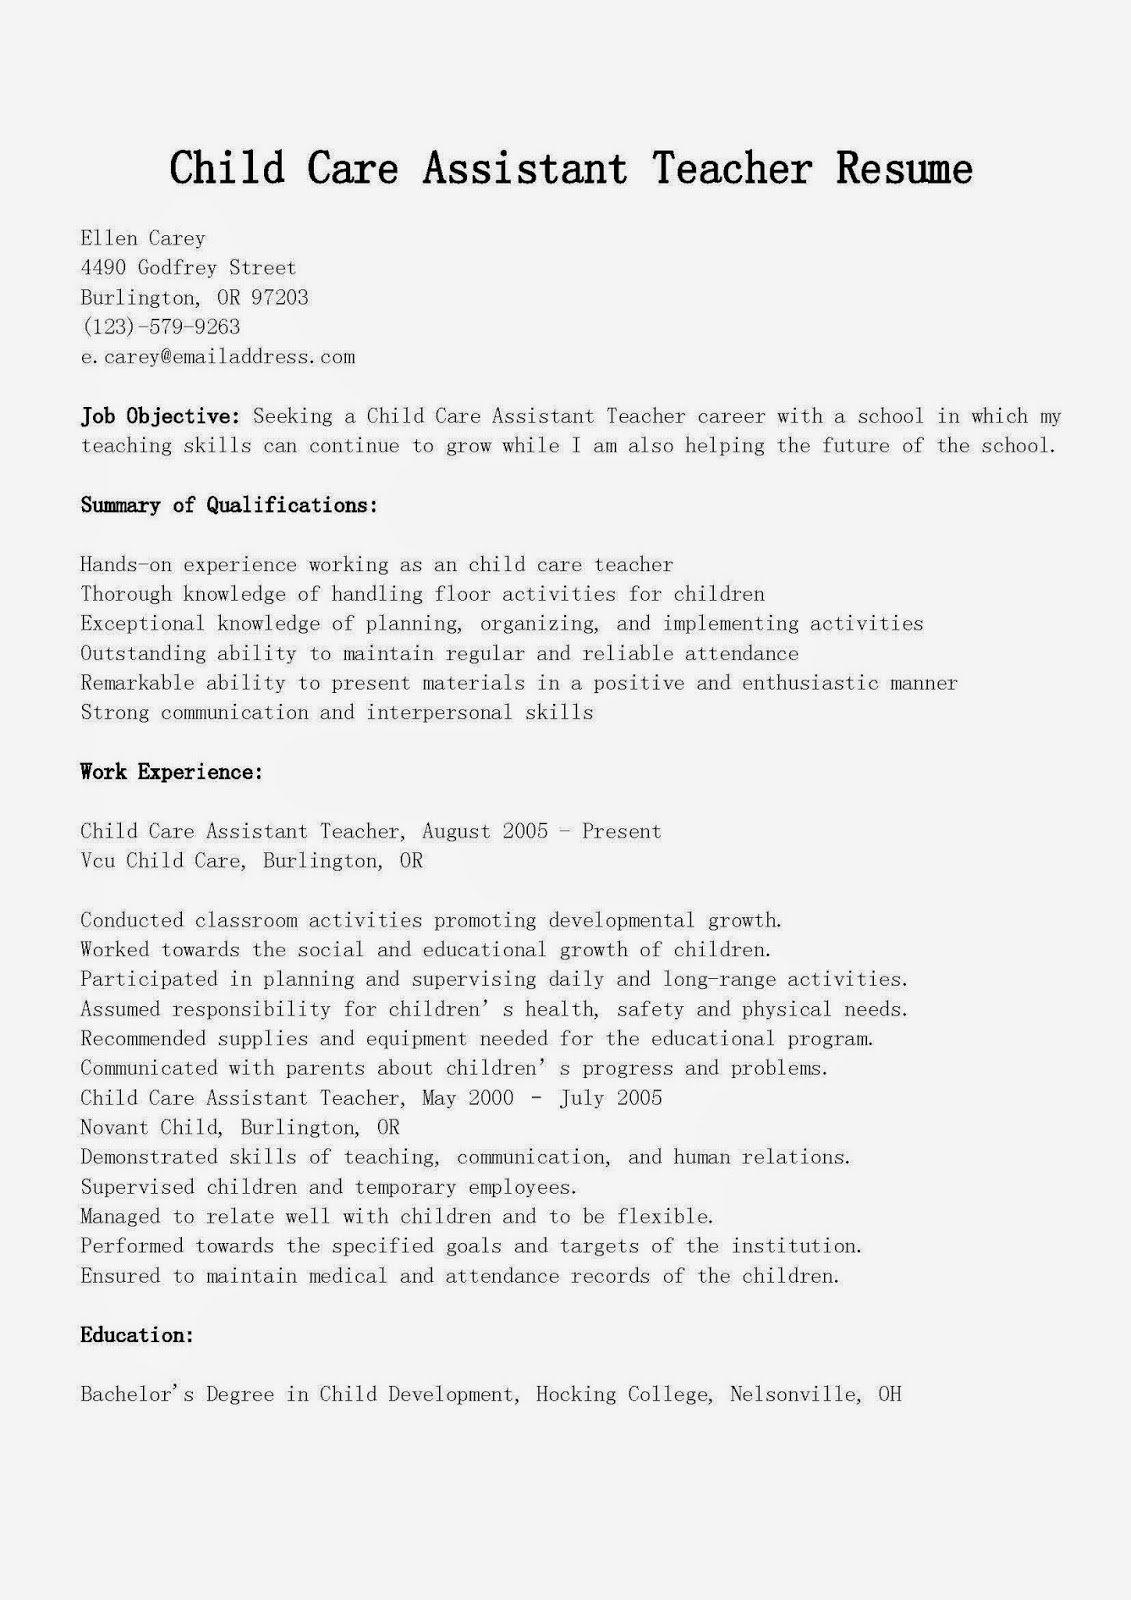 Resume Samples Child Care assistant Teacher Resume Sample